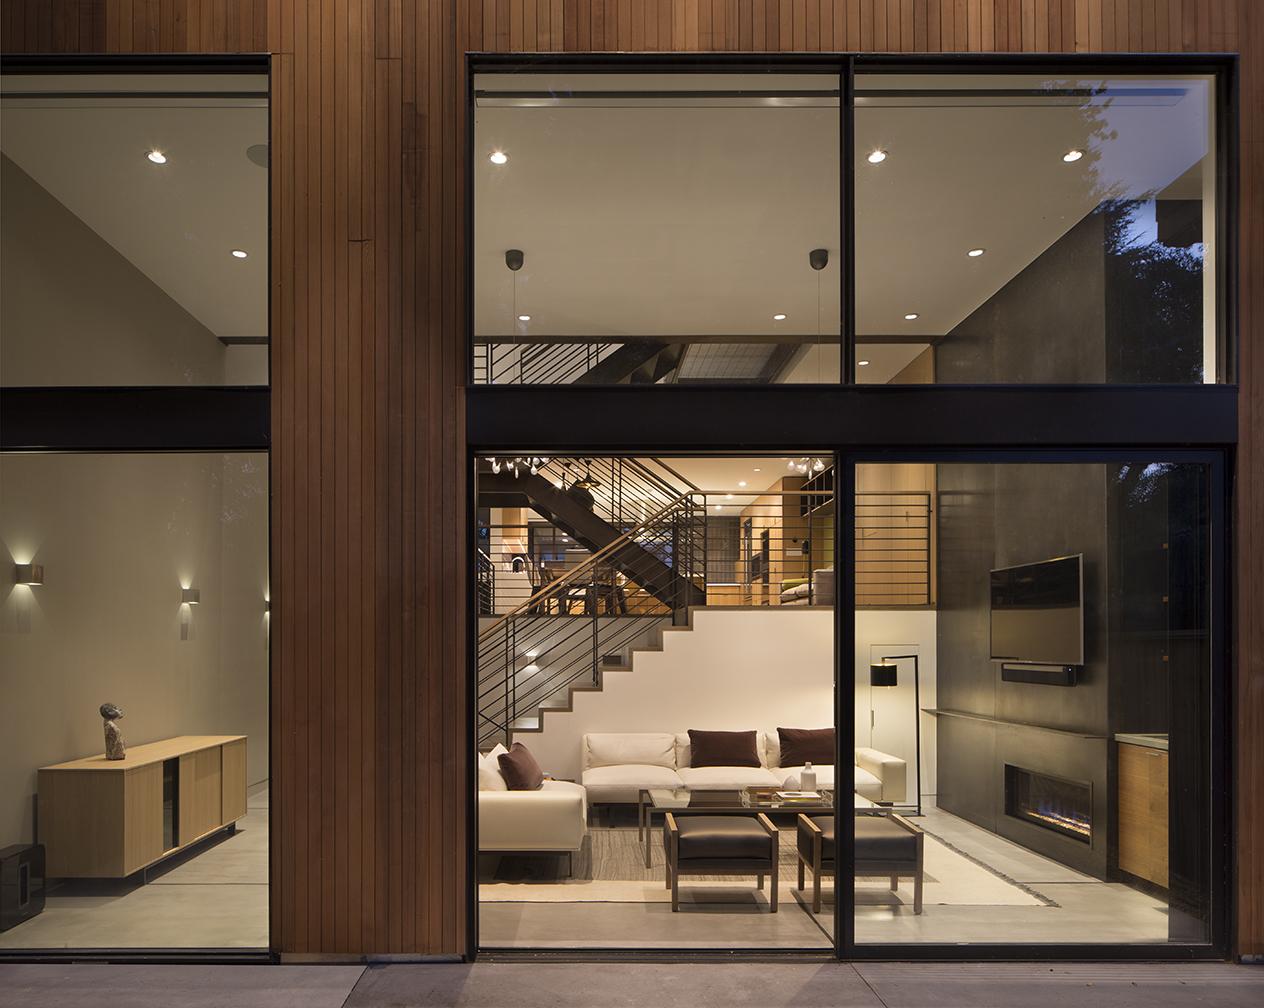 Honor Award Residential 'Small Site'| AIASMC Design Awards 2016